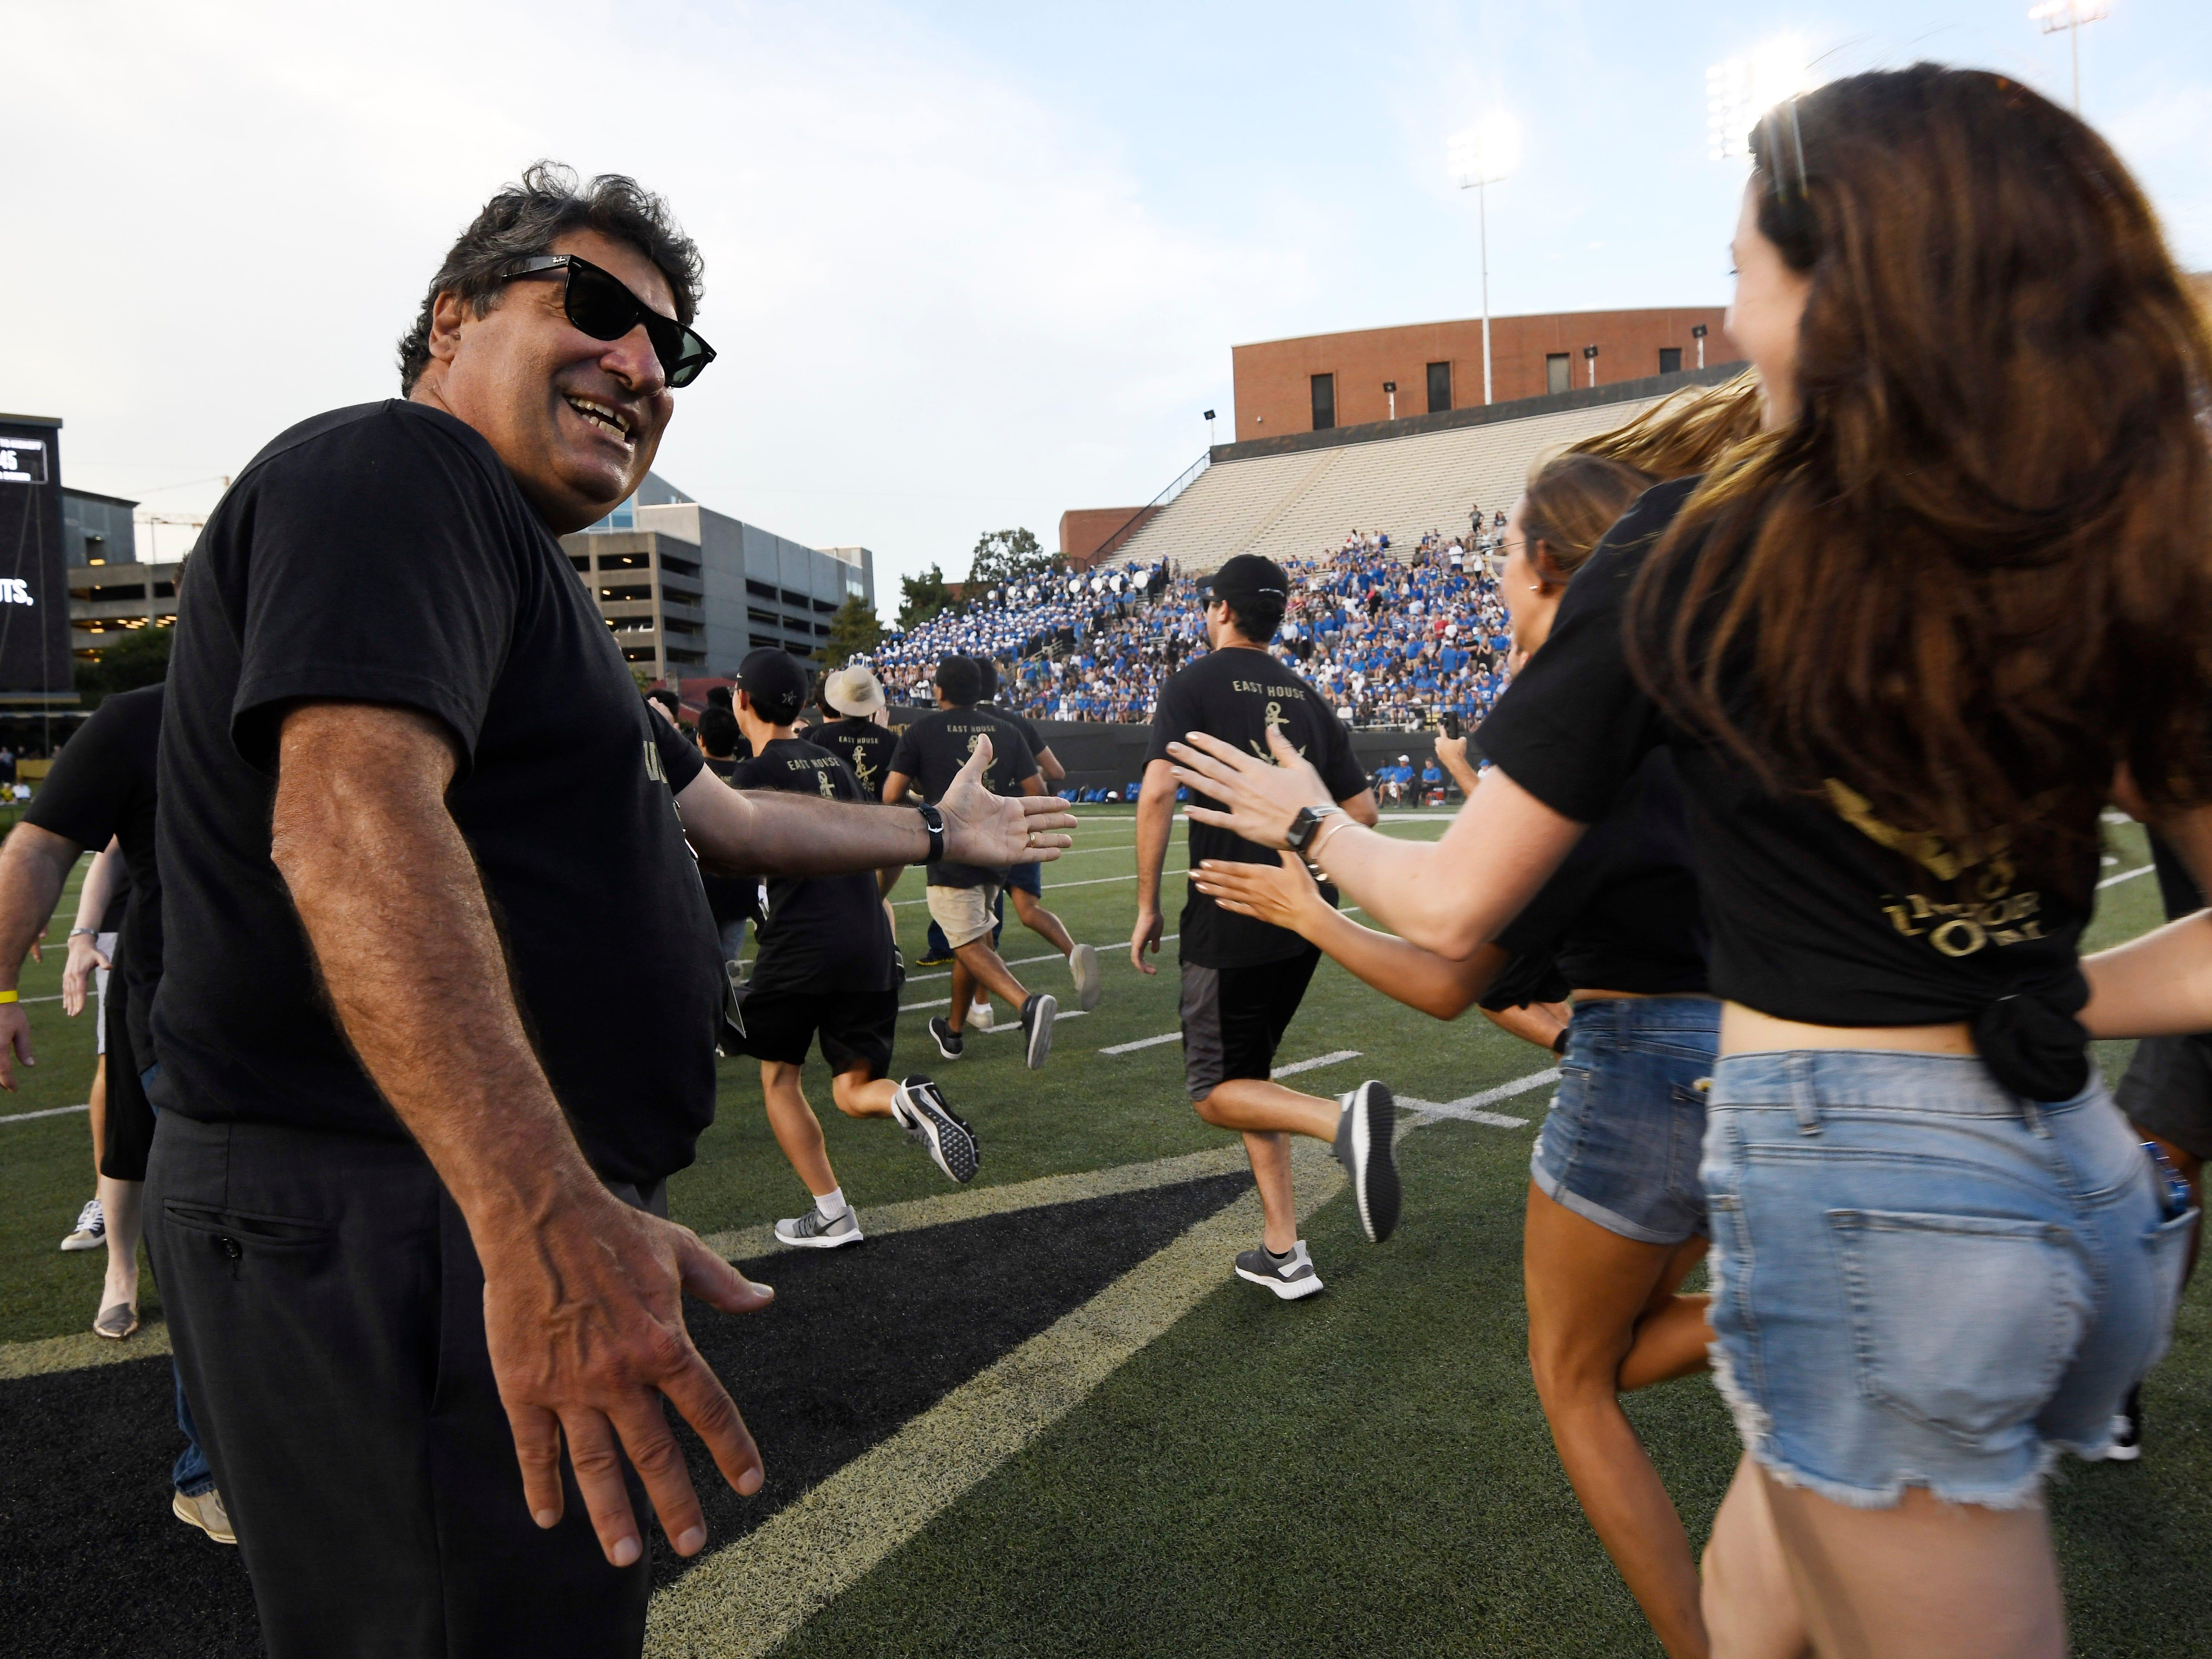 Vanderbilt Chancellor Nicholas Zeppos shakes hands with the students in the Anchor Dash before the game against MTSU at Vanderbilt Stadium Saturday, Sept. 1, 2018, in Nashville, Tenn.